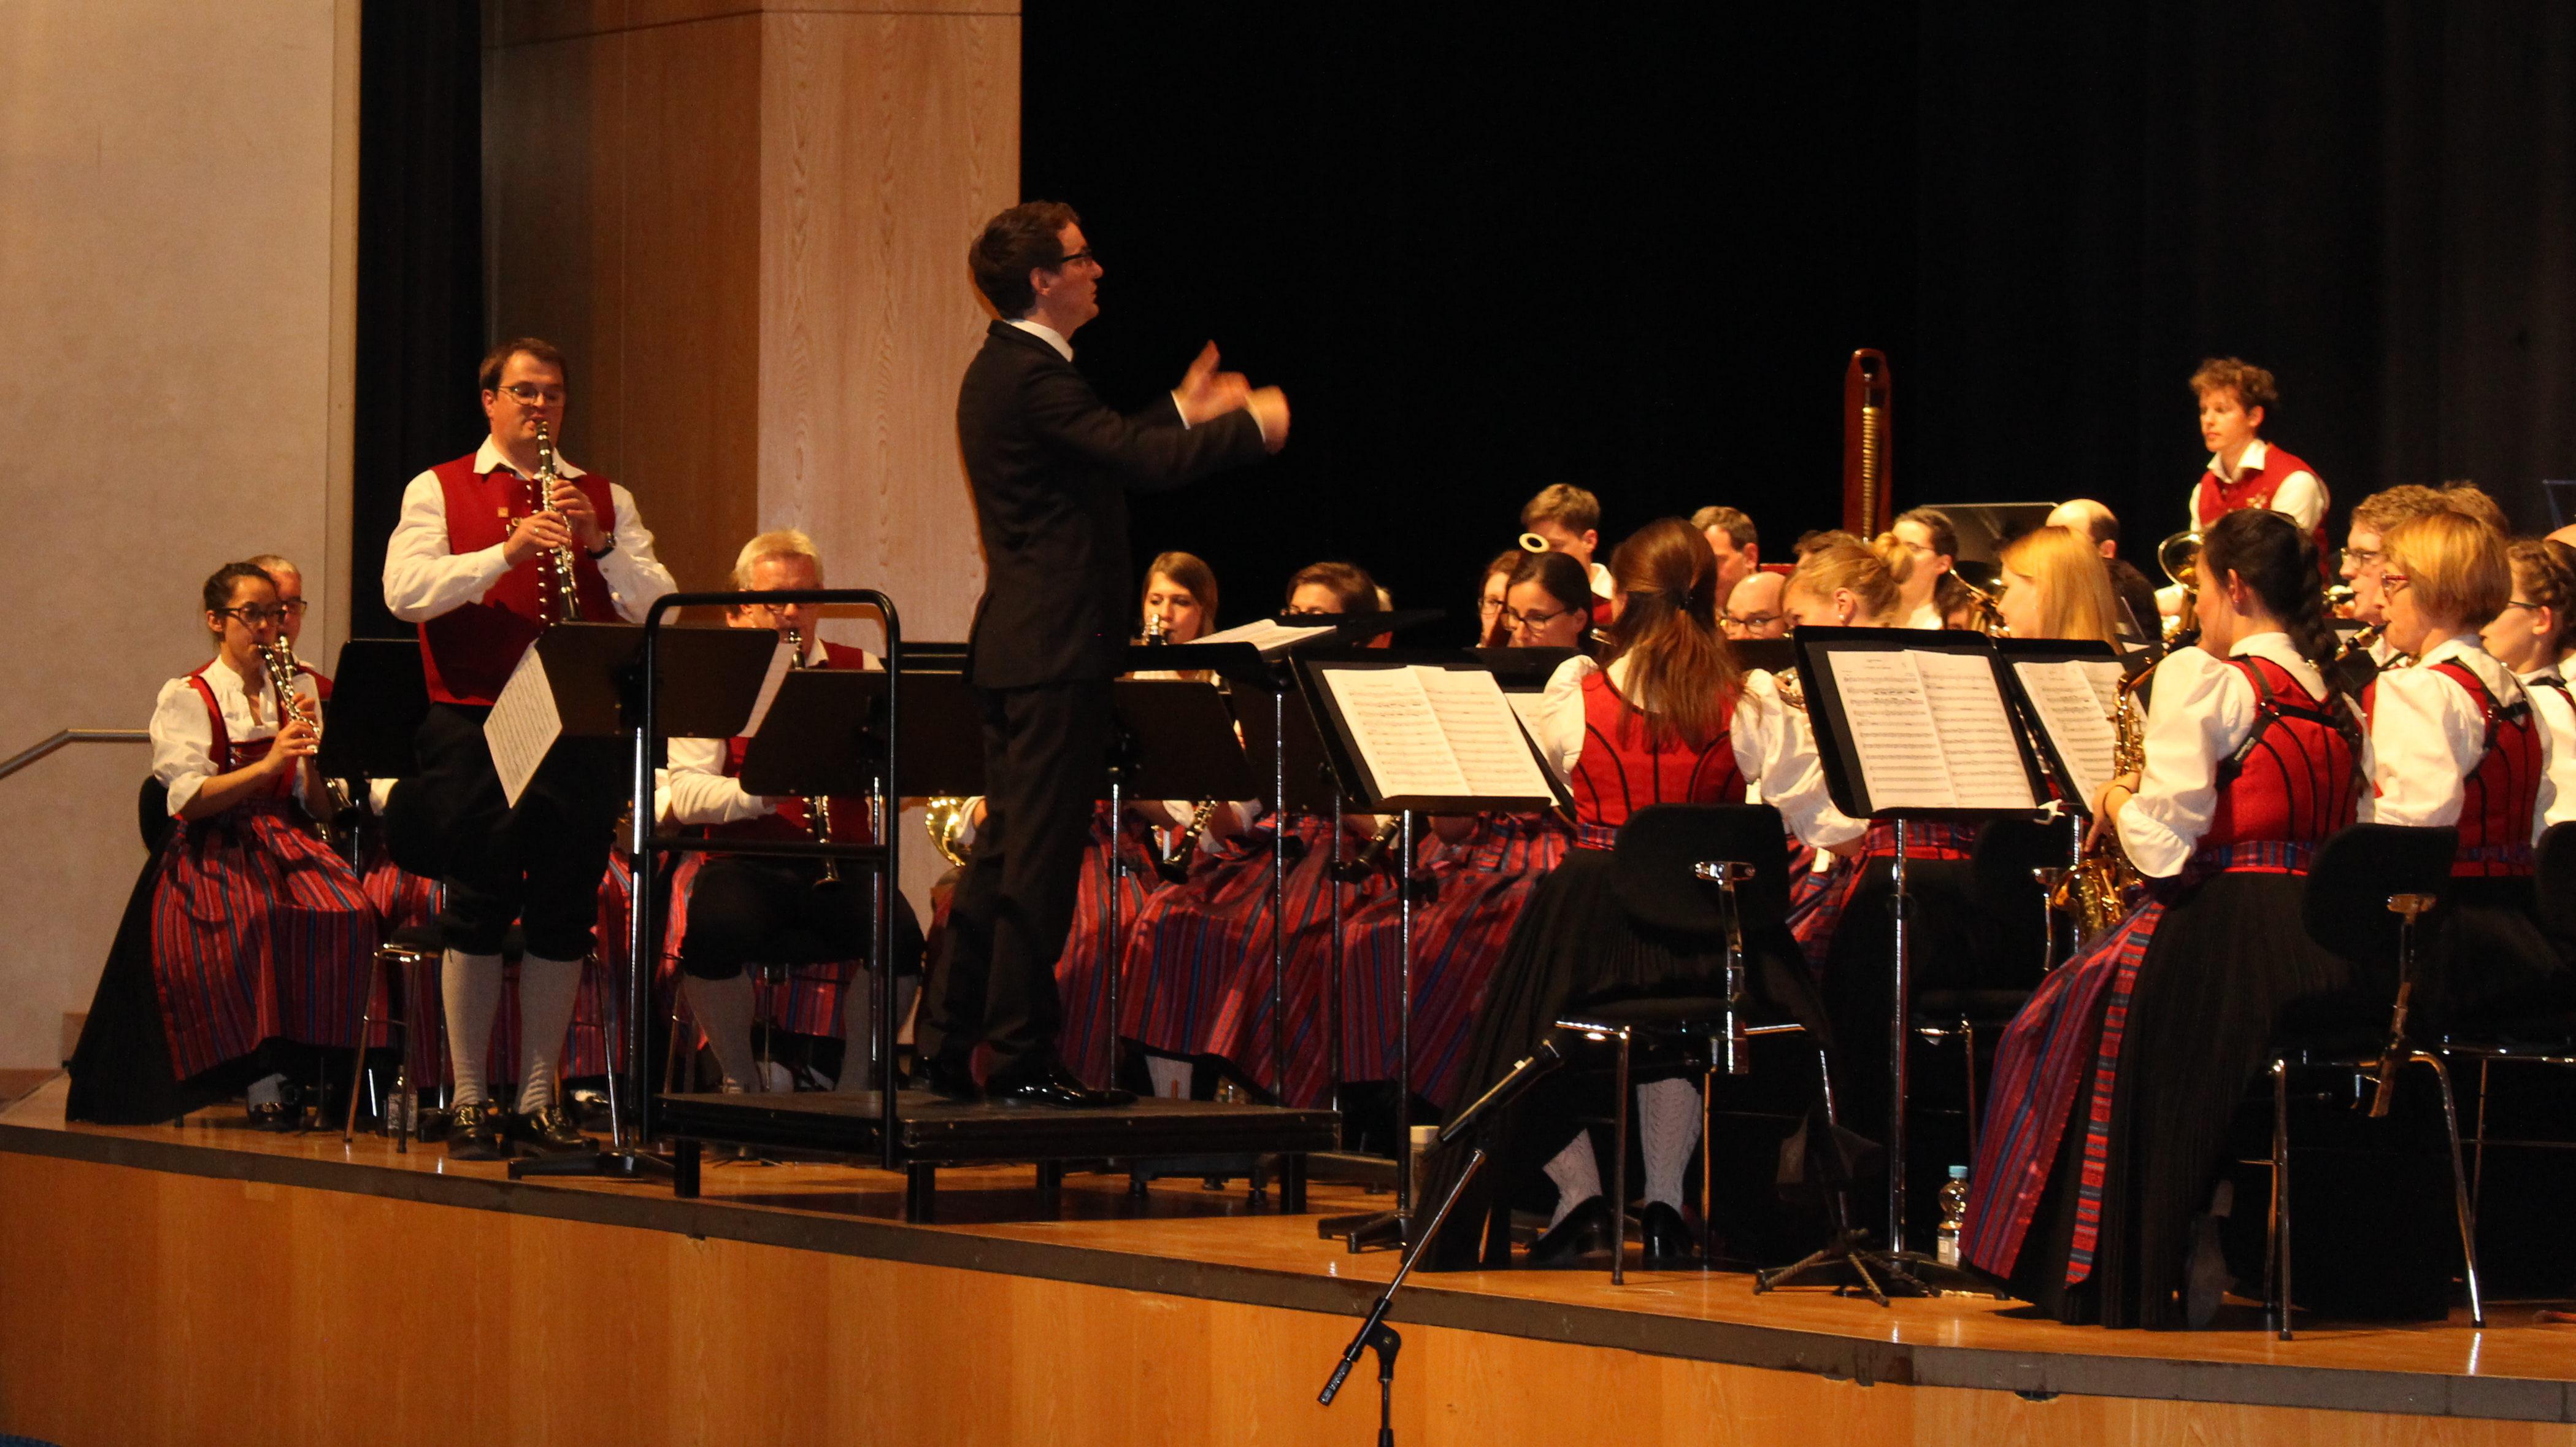 Clarinet Concert mit Solist Matthias Frankenhauser